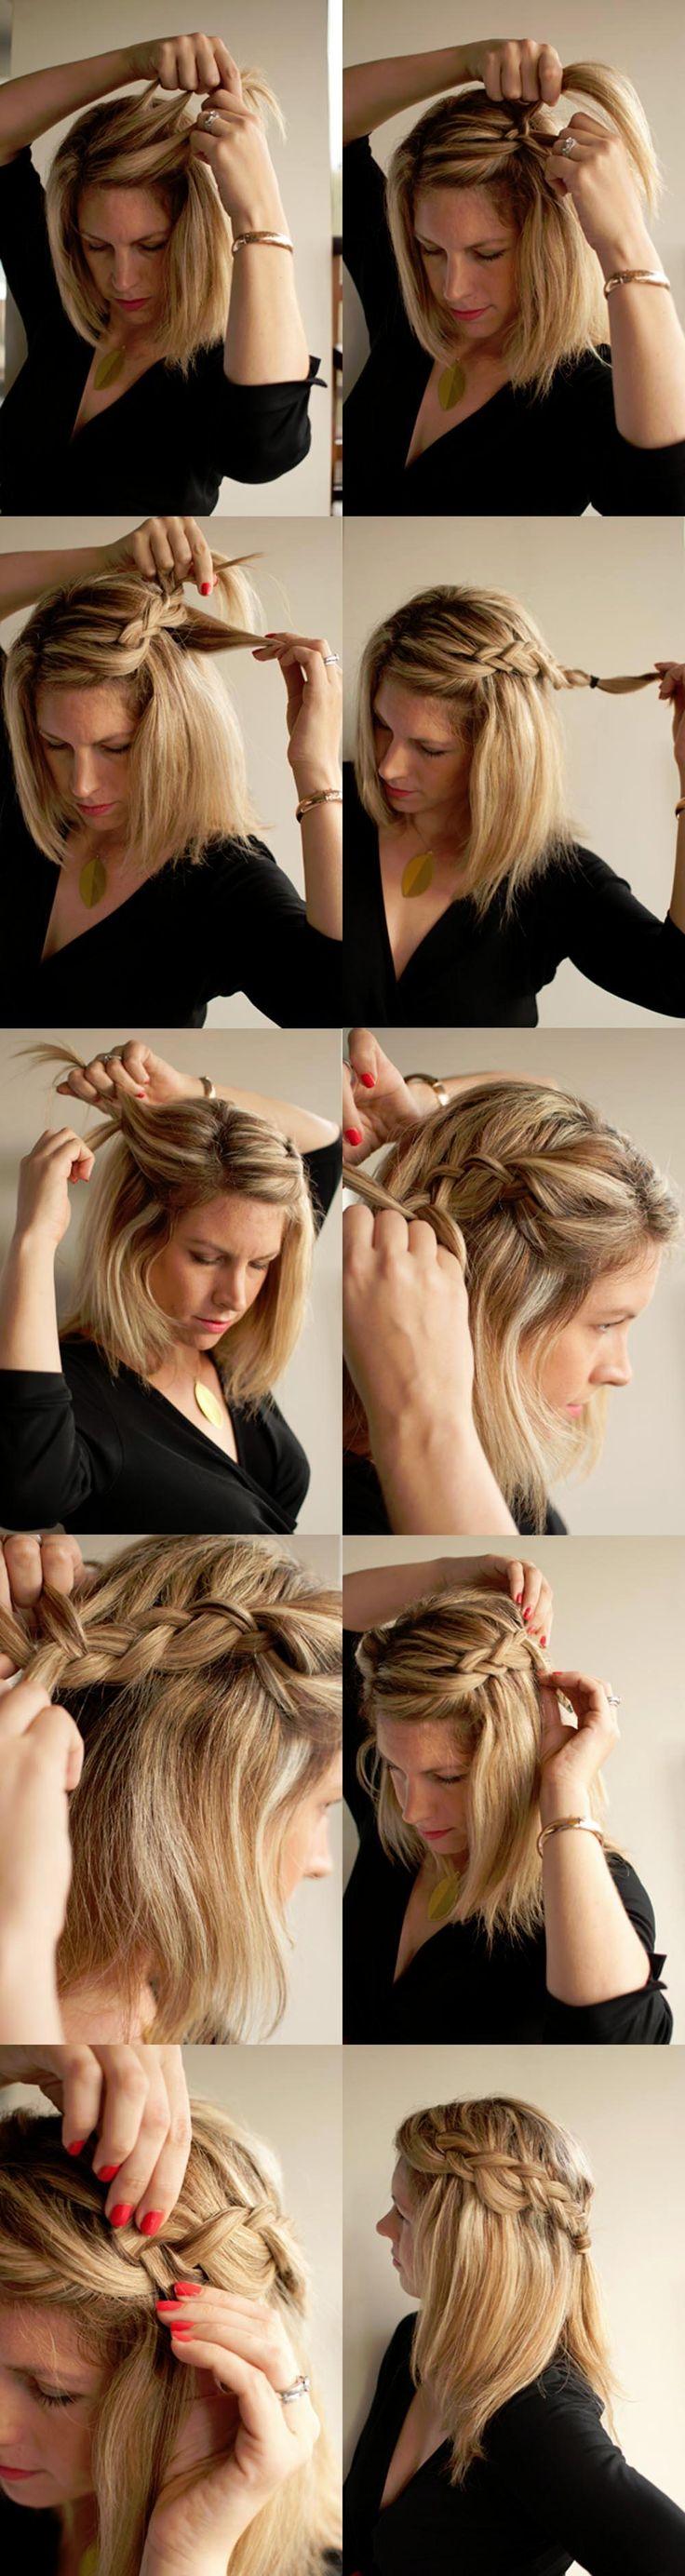 Backwards-or-inside-out-braid-Tutorial   #hair tutorials #hairstyle tutorials